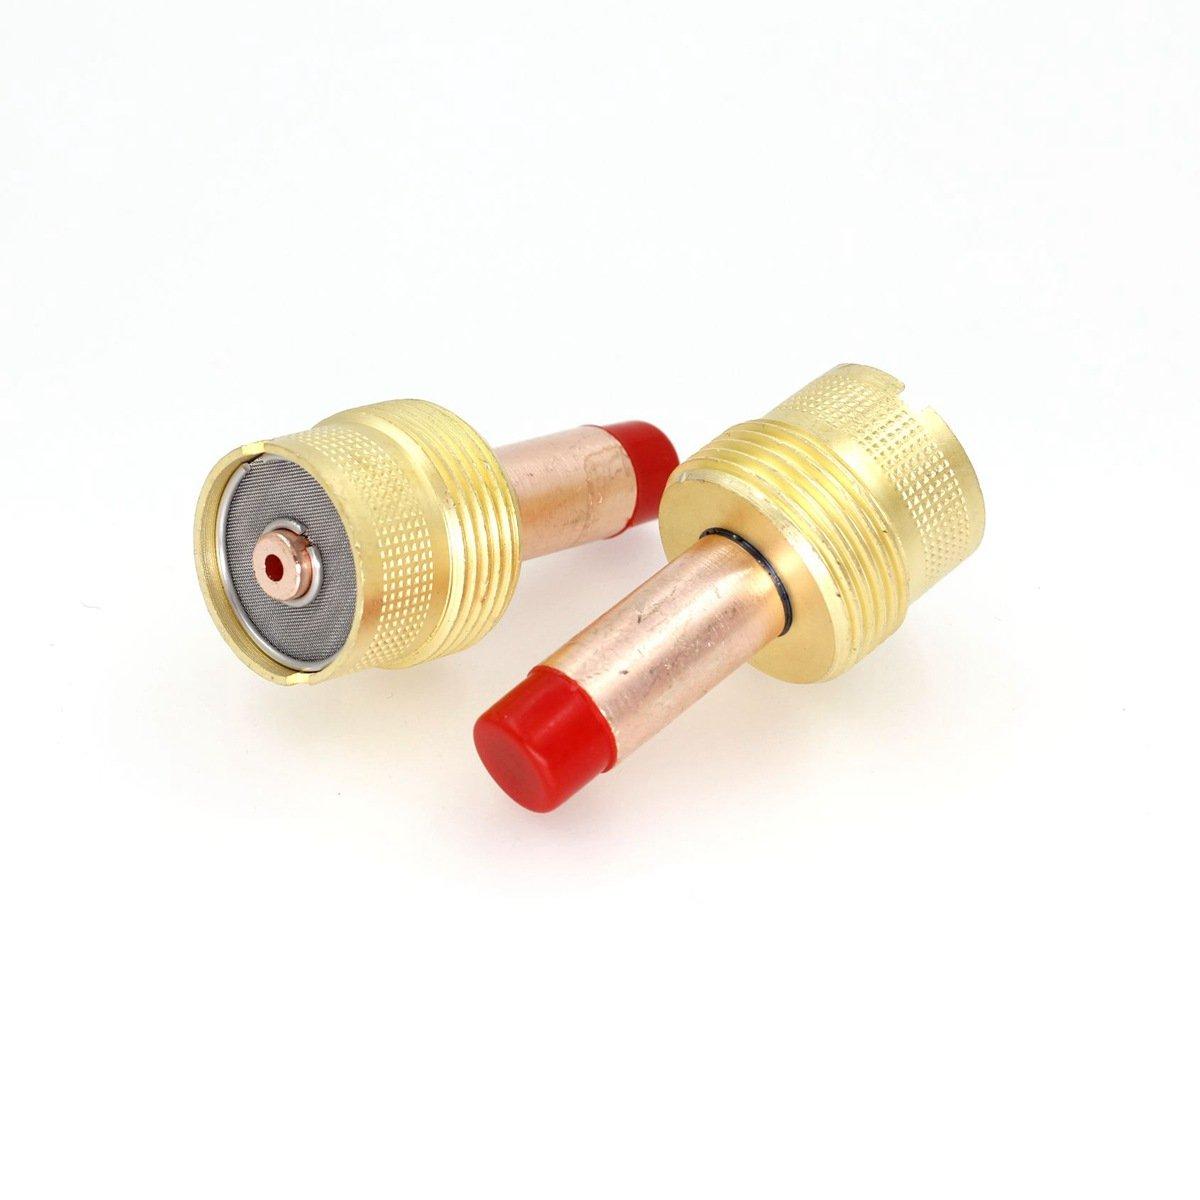 2pcs 45V64 Gas Lens Collet Body Large Diameter 3//32 2.4mm Designed for TIG Welding Torch WP-17 WP-18 WP-26